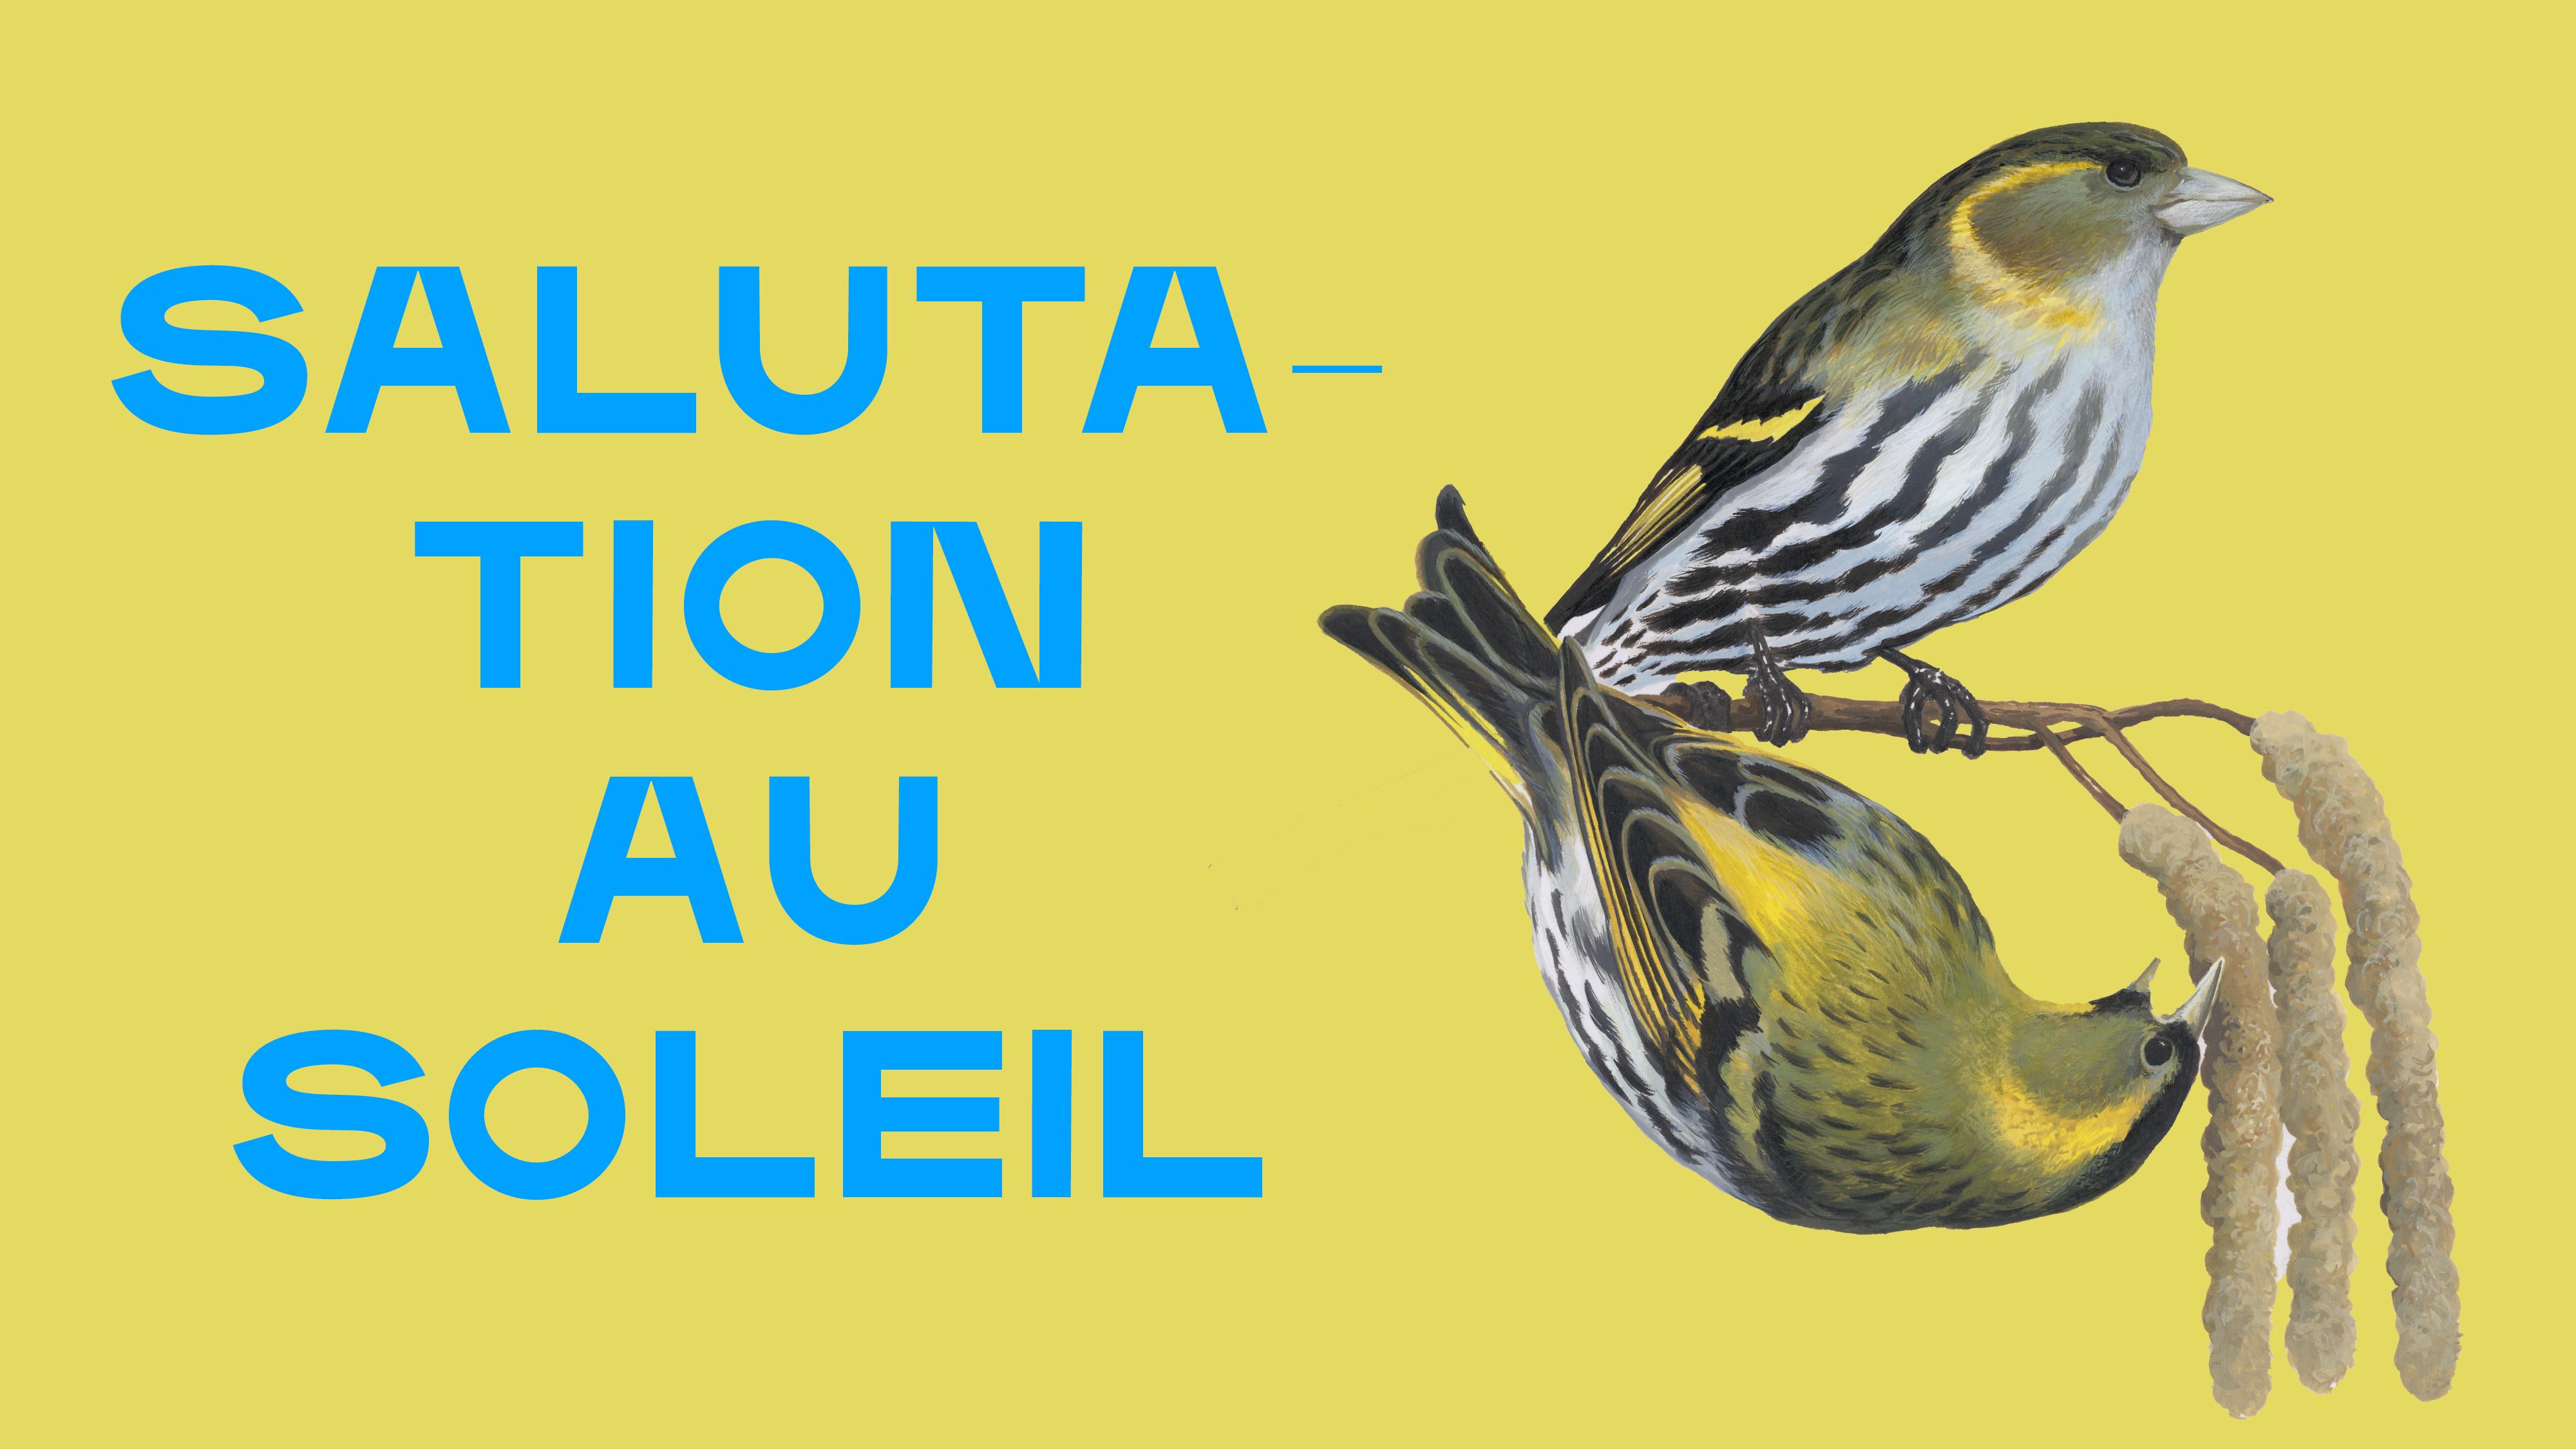 SALUTATION AU SOLEIL - SAMEDI 24 JUILLET